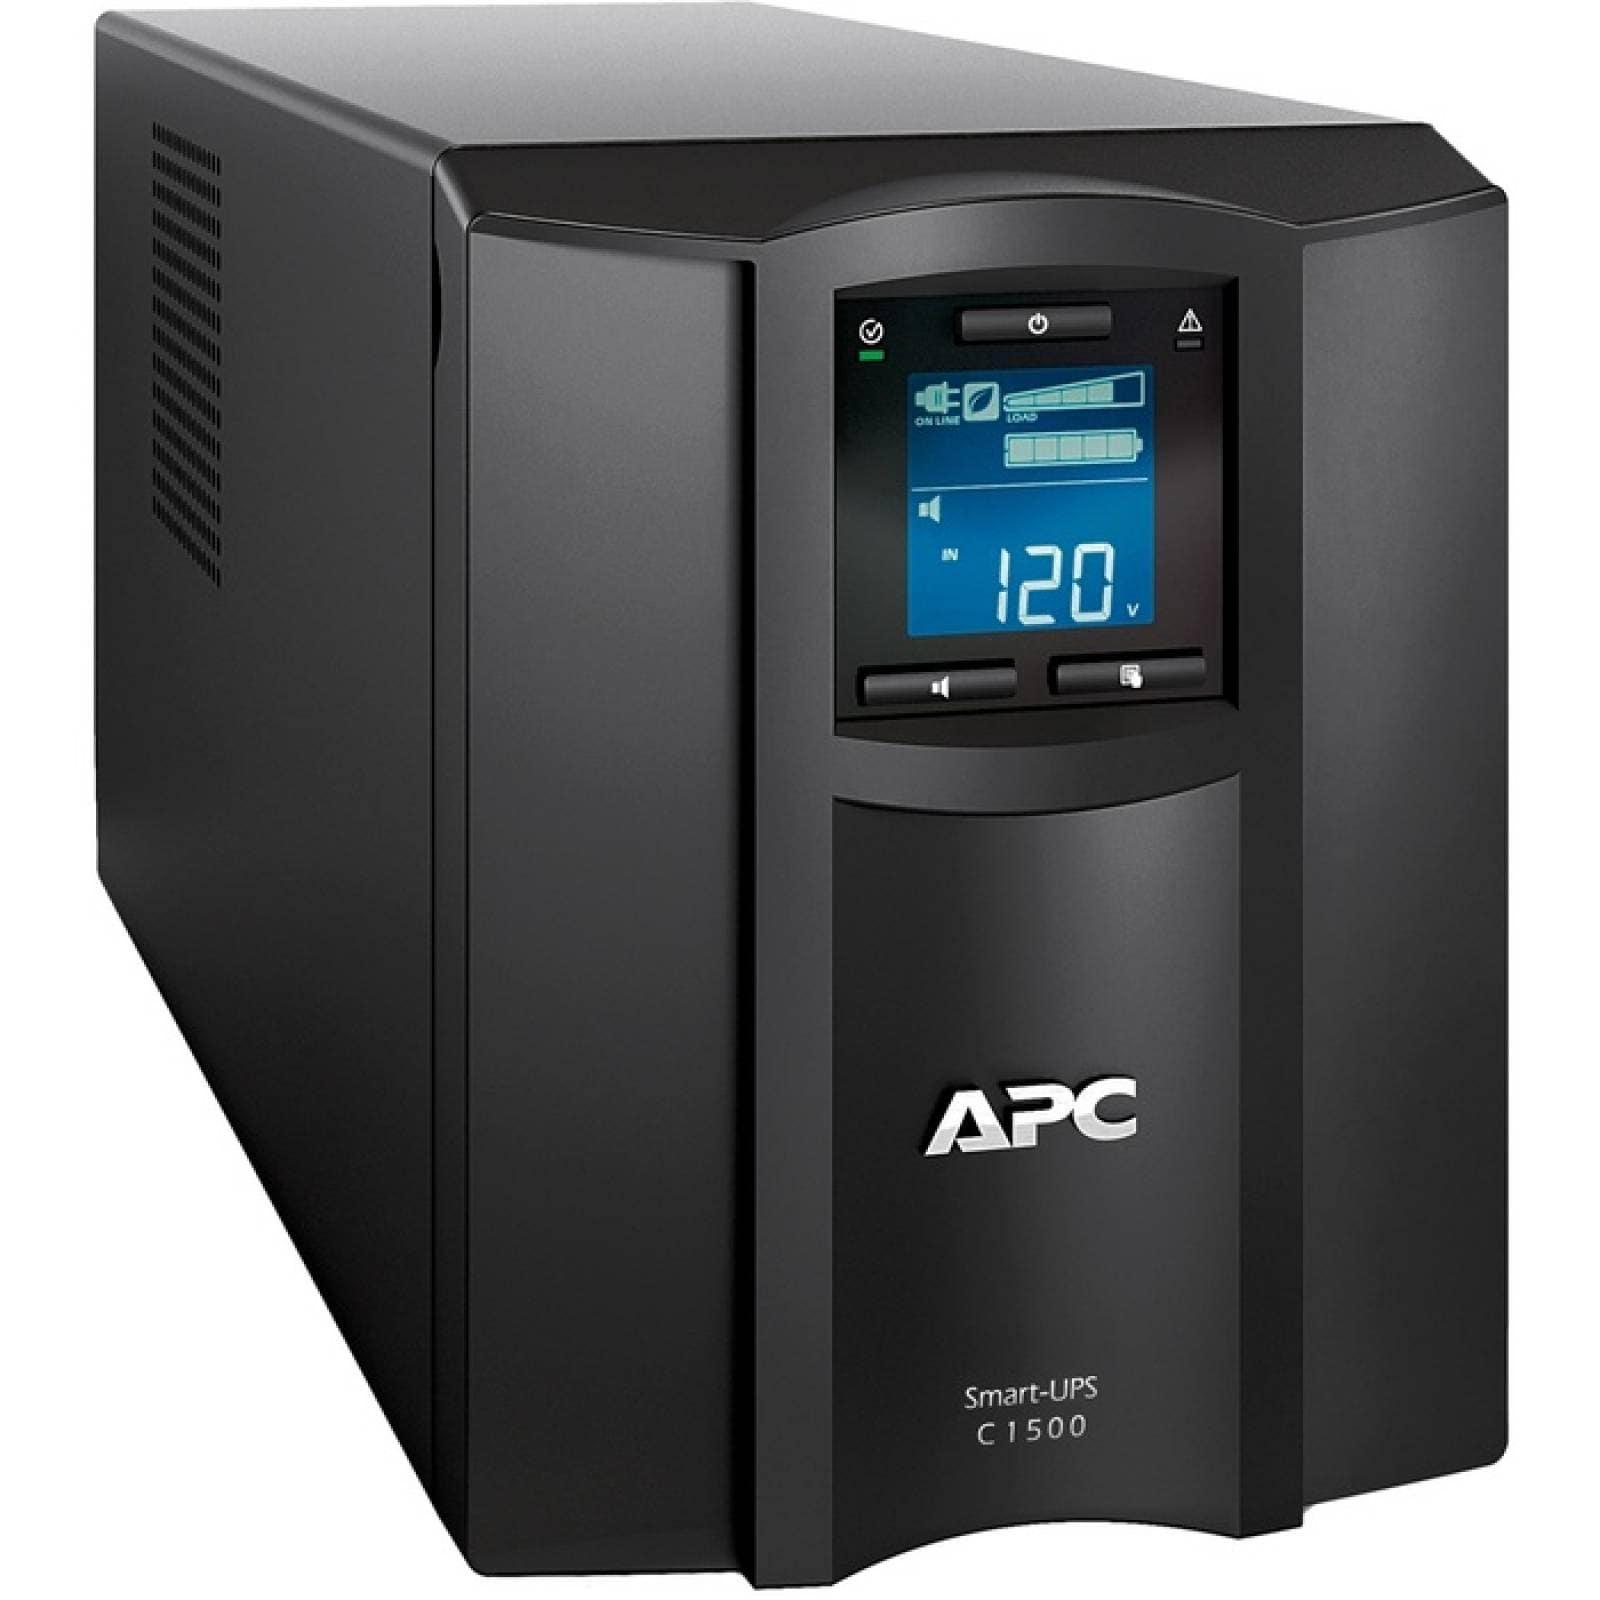 APC by Schneider Electric SmartUPS SMC1500C 1500VA UPS de escritorio